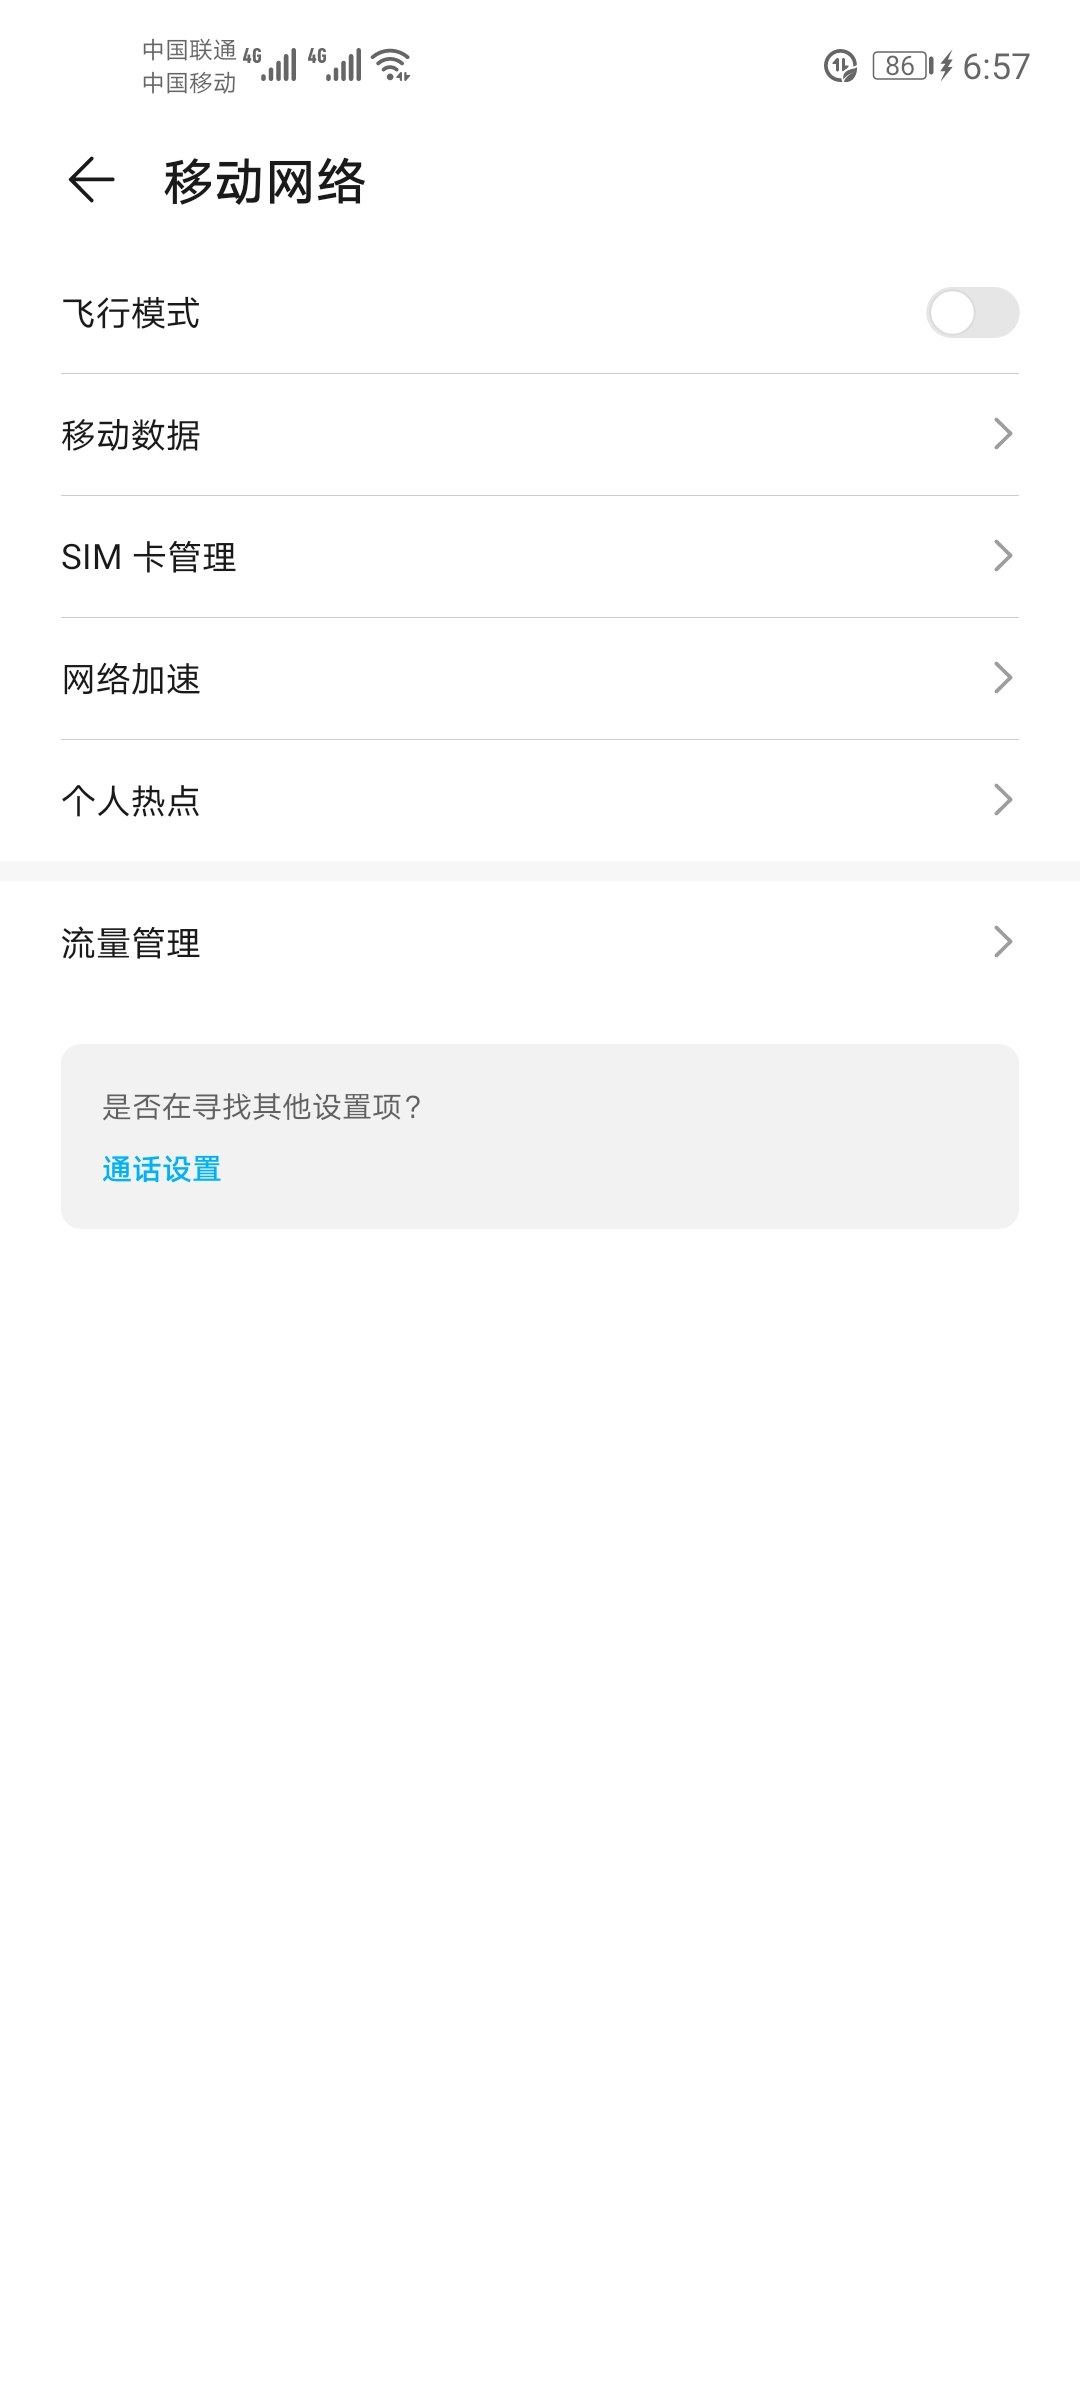 Screenshot_20200628_185759_com.android.settings.jpg